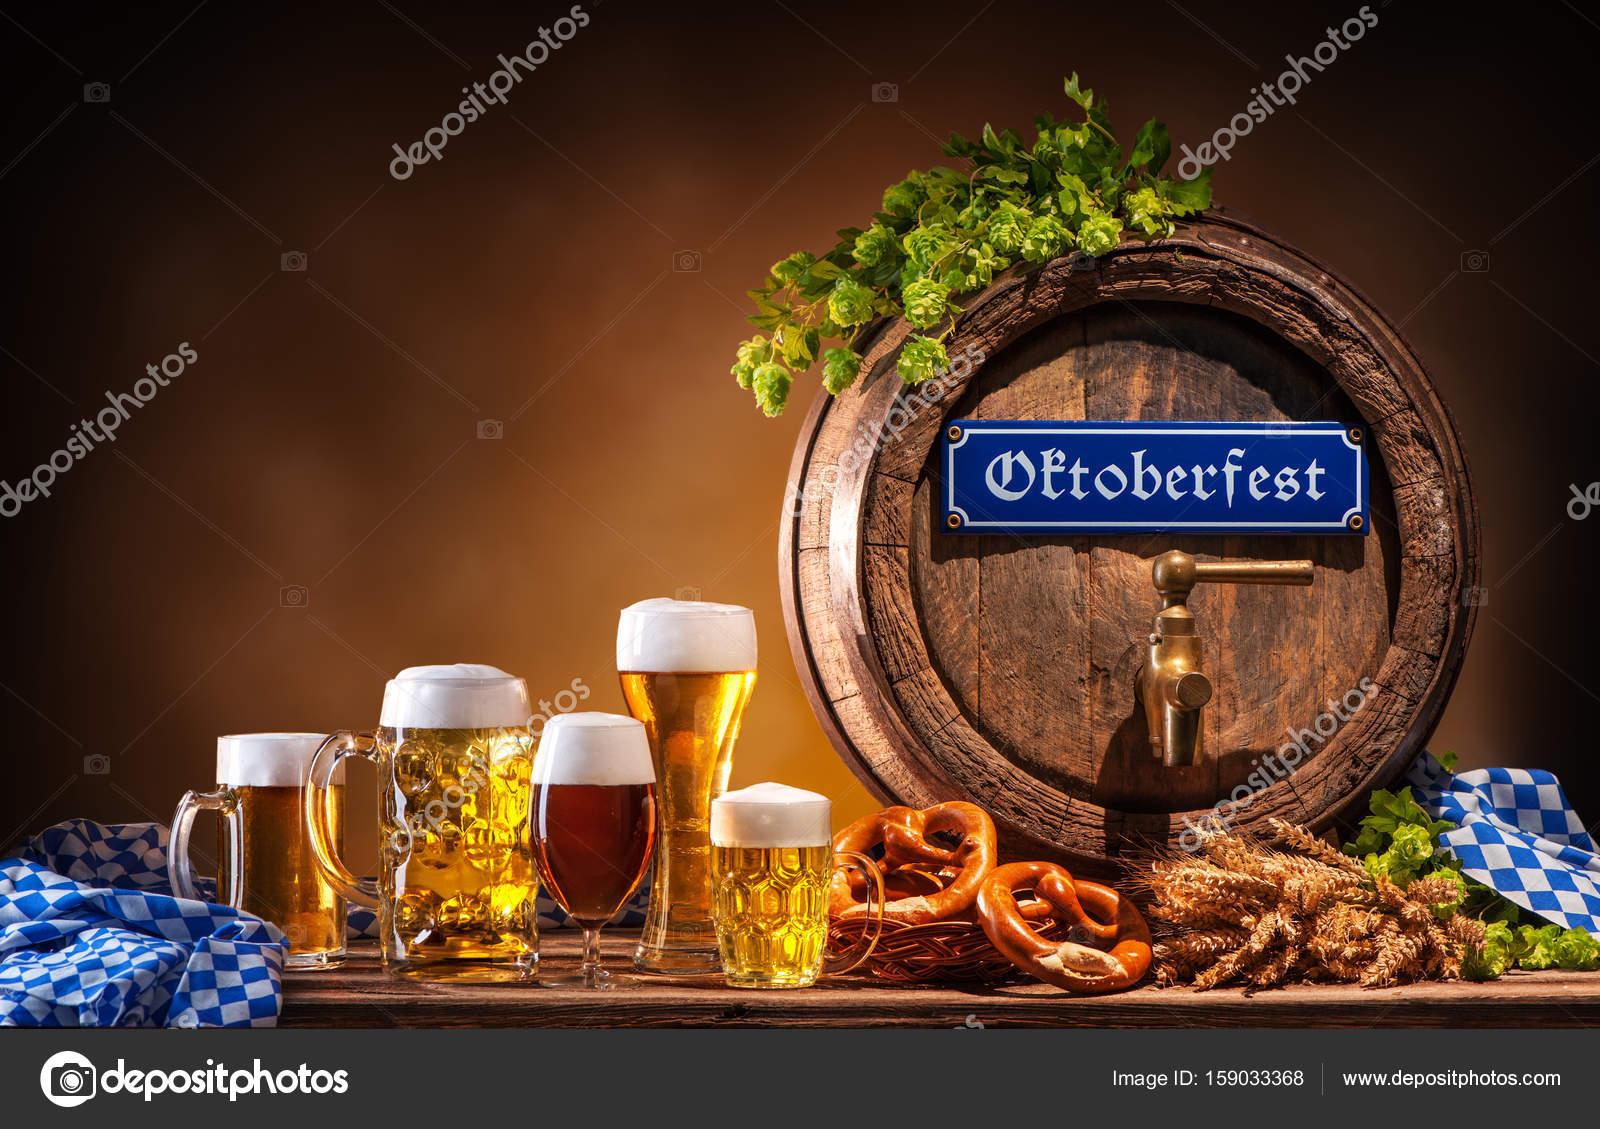 Bicchieri di birra e barilotto di birra oktoberfest foto for Bicchieri birra prezzi